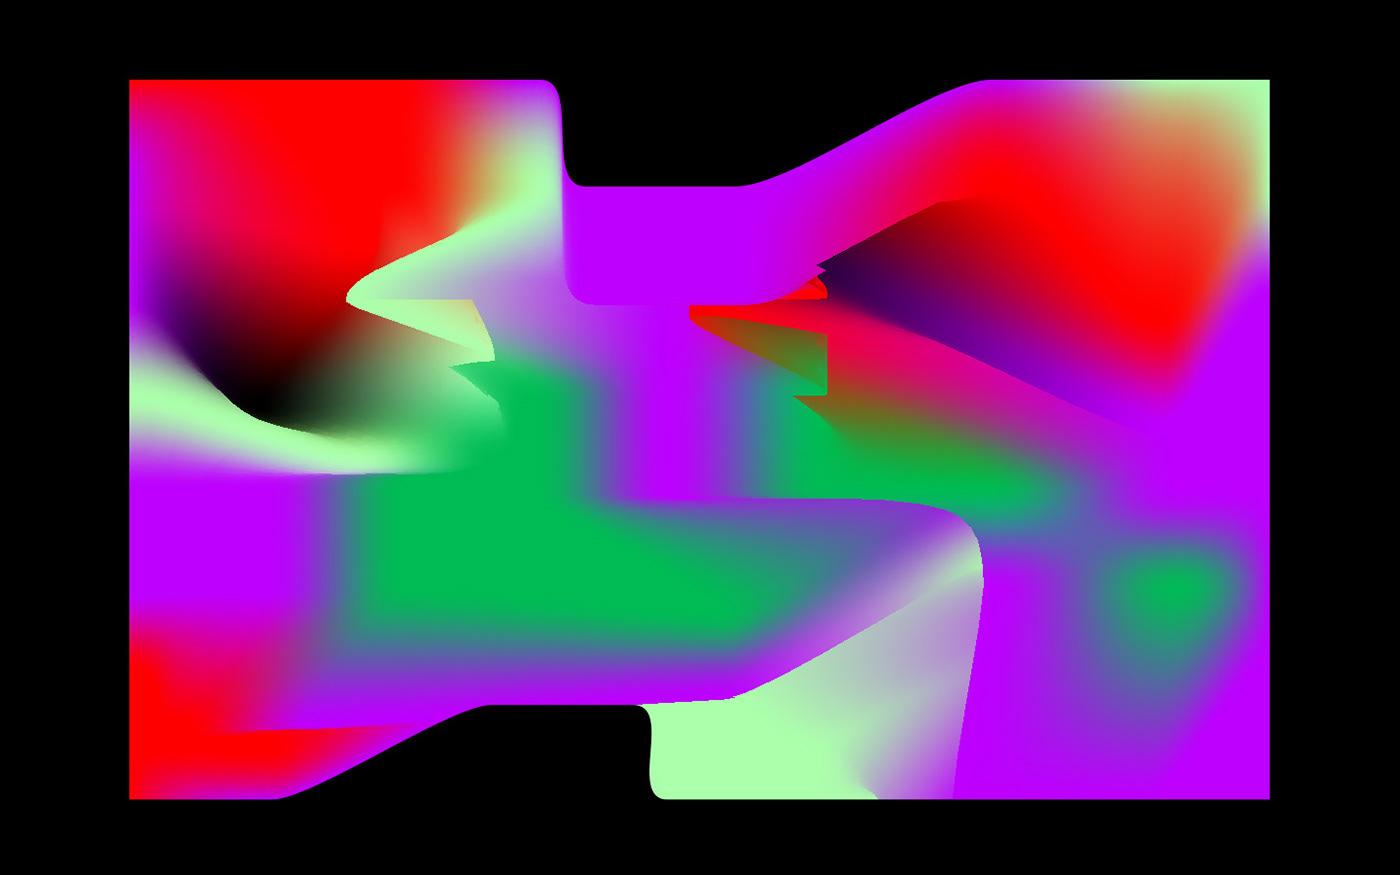 Image may contain: art, creativity and shape